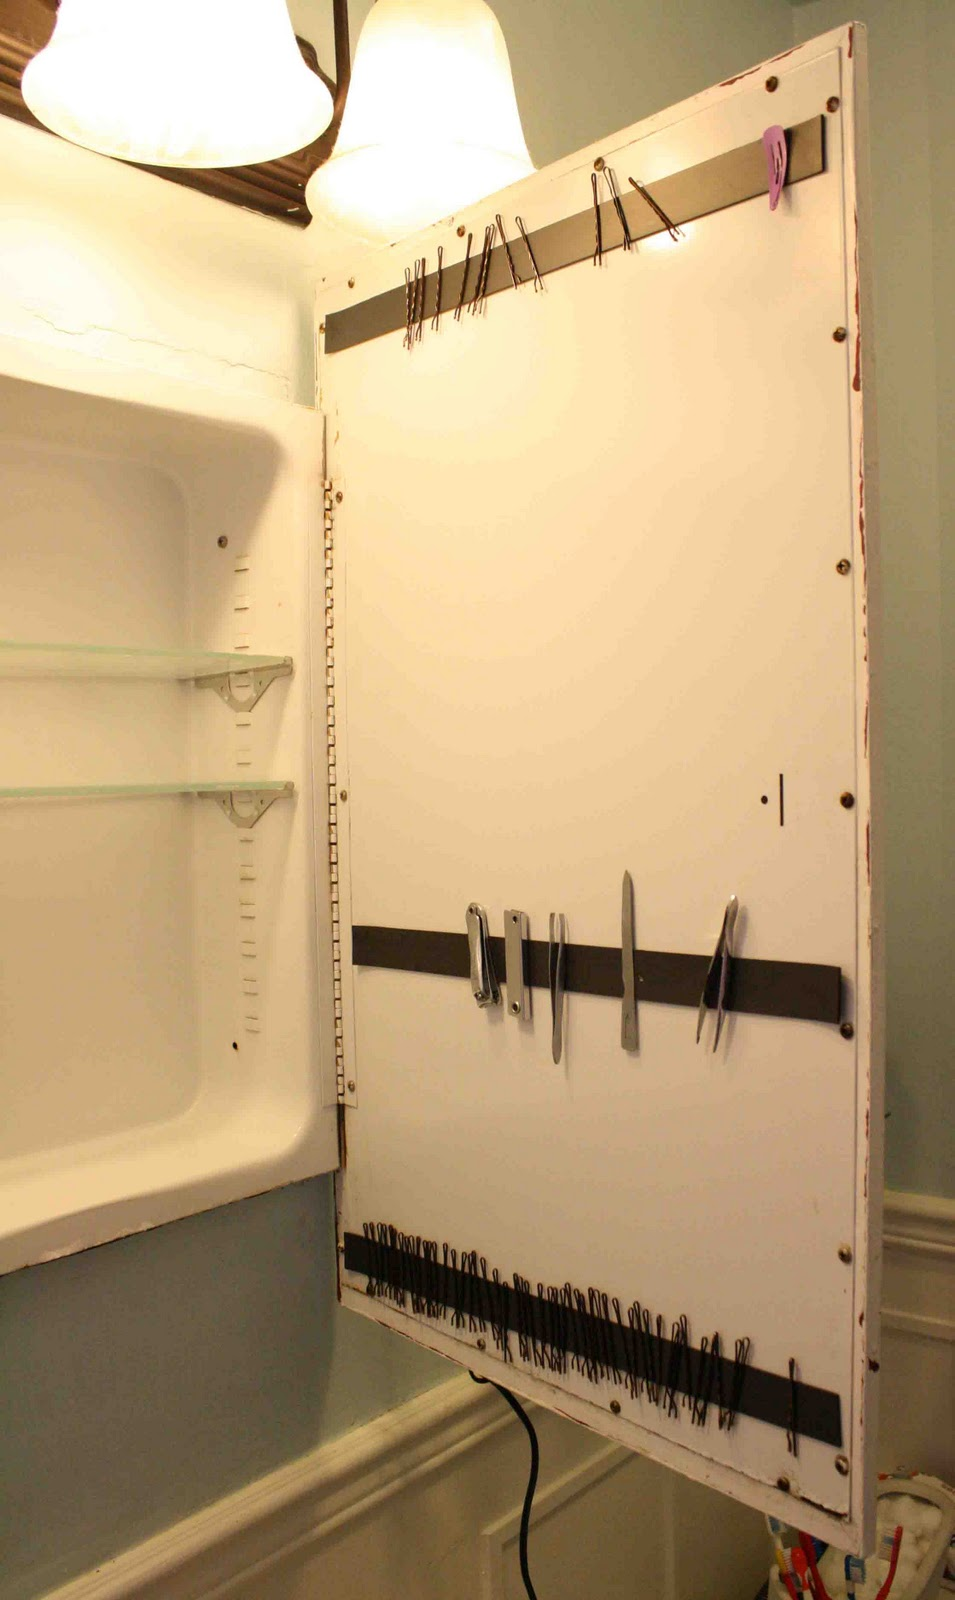 Medicine Cabinet Magnet Superwoman 2 Minute Bathroom Organization